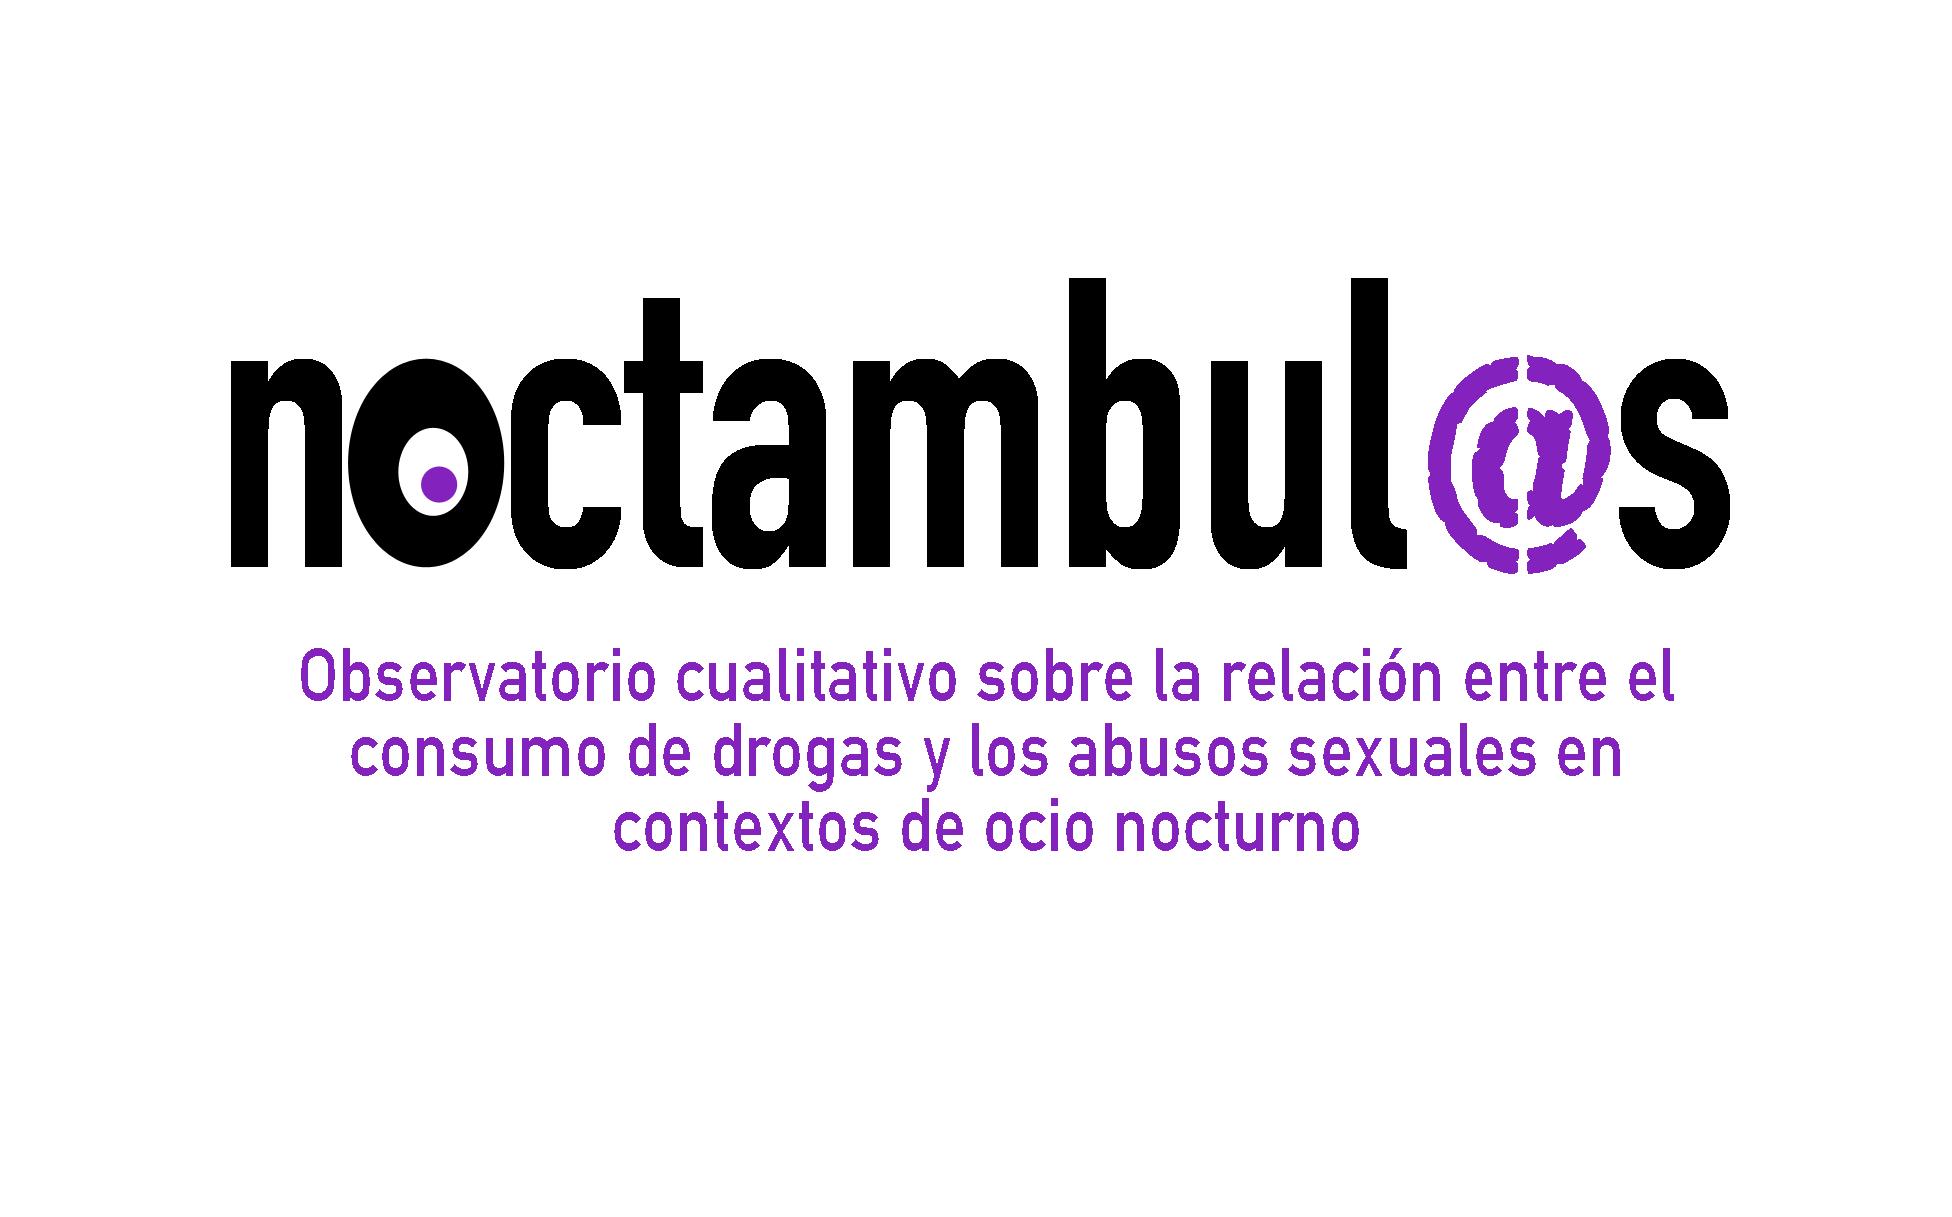 LOGO Noctambul@s